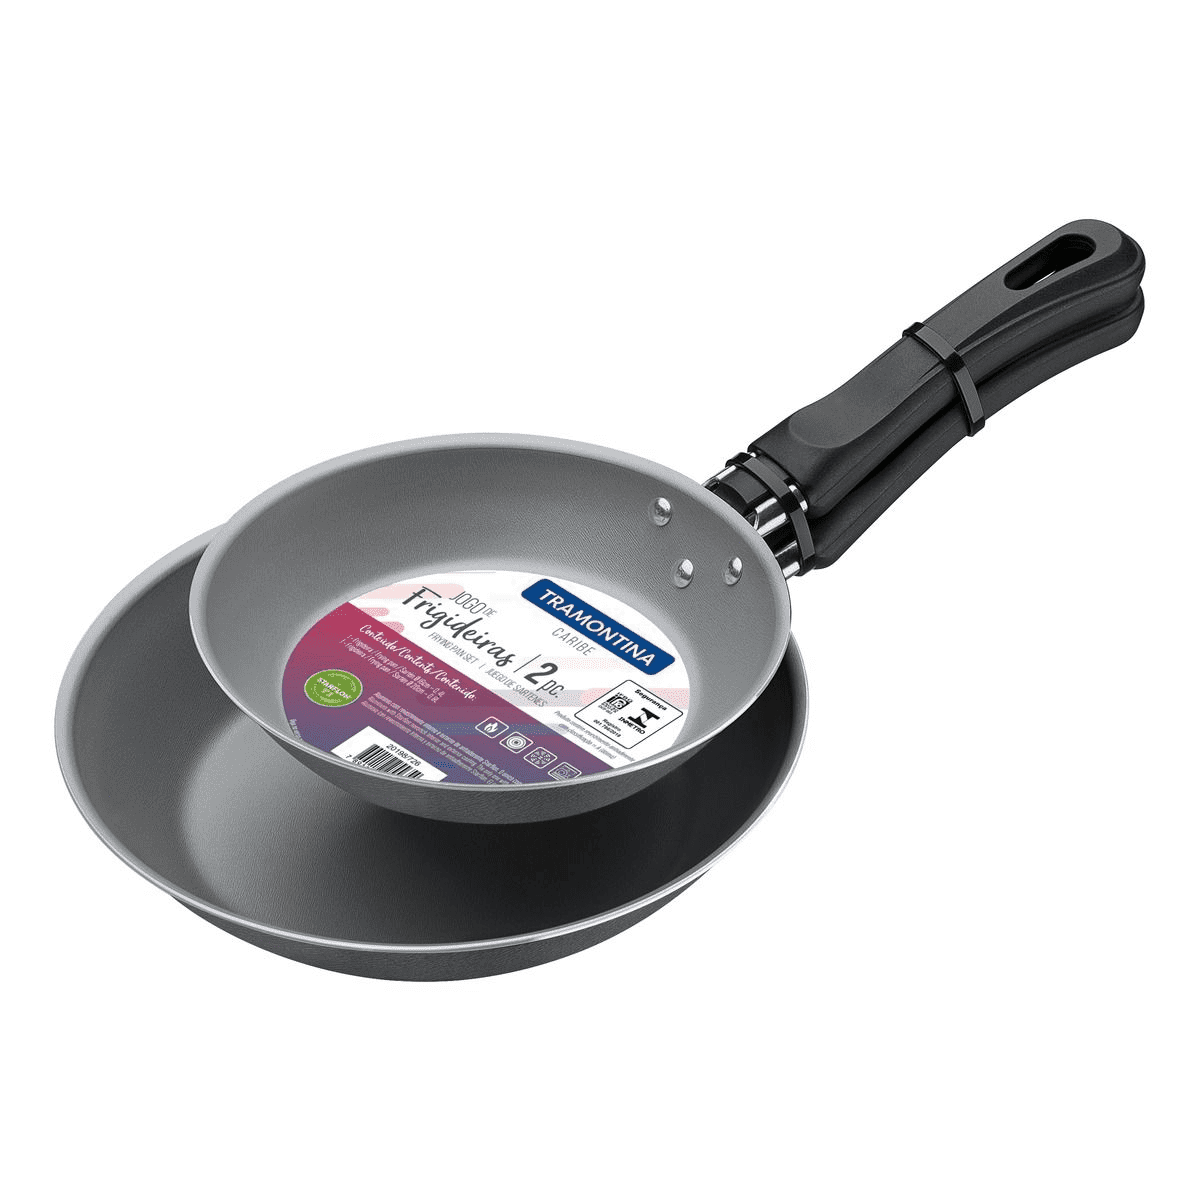 Conjunto Frigideiras Caribe 2 Peças Cinza Tramontina